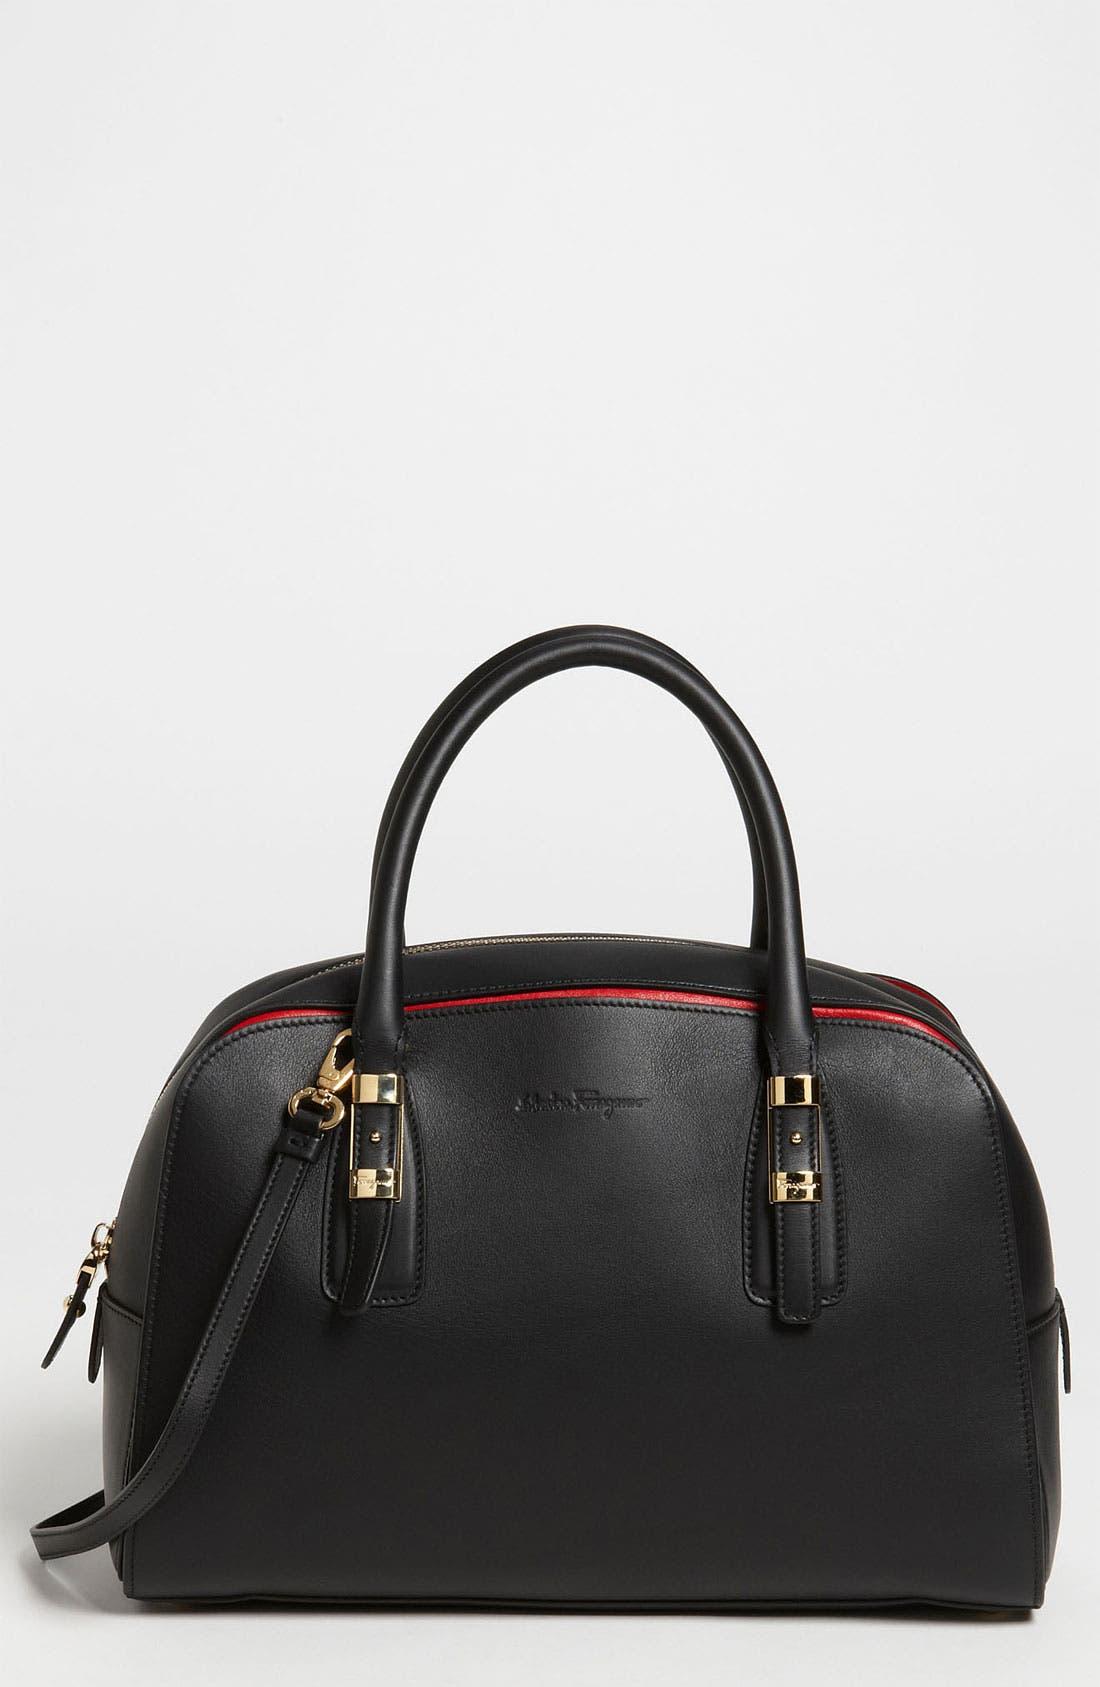 Alternate Image 1 Selected - Salvatore Ferragamo 'Emmy - Small' Leather Crossbody Bag